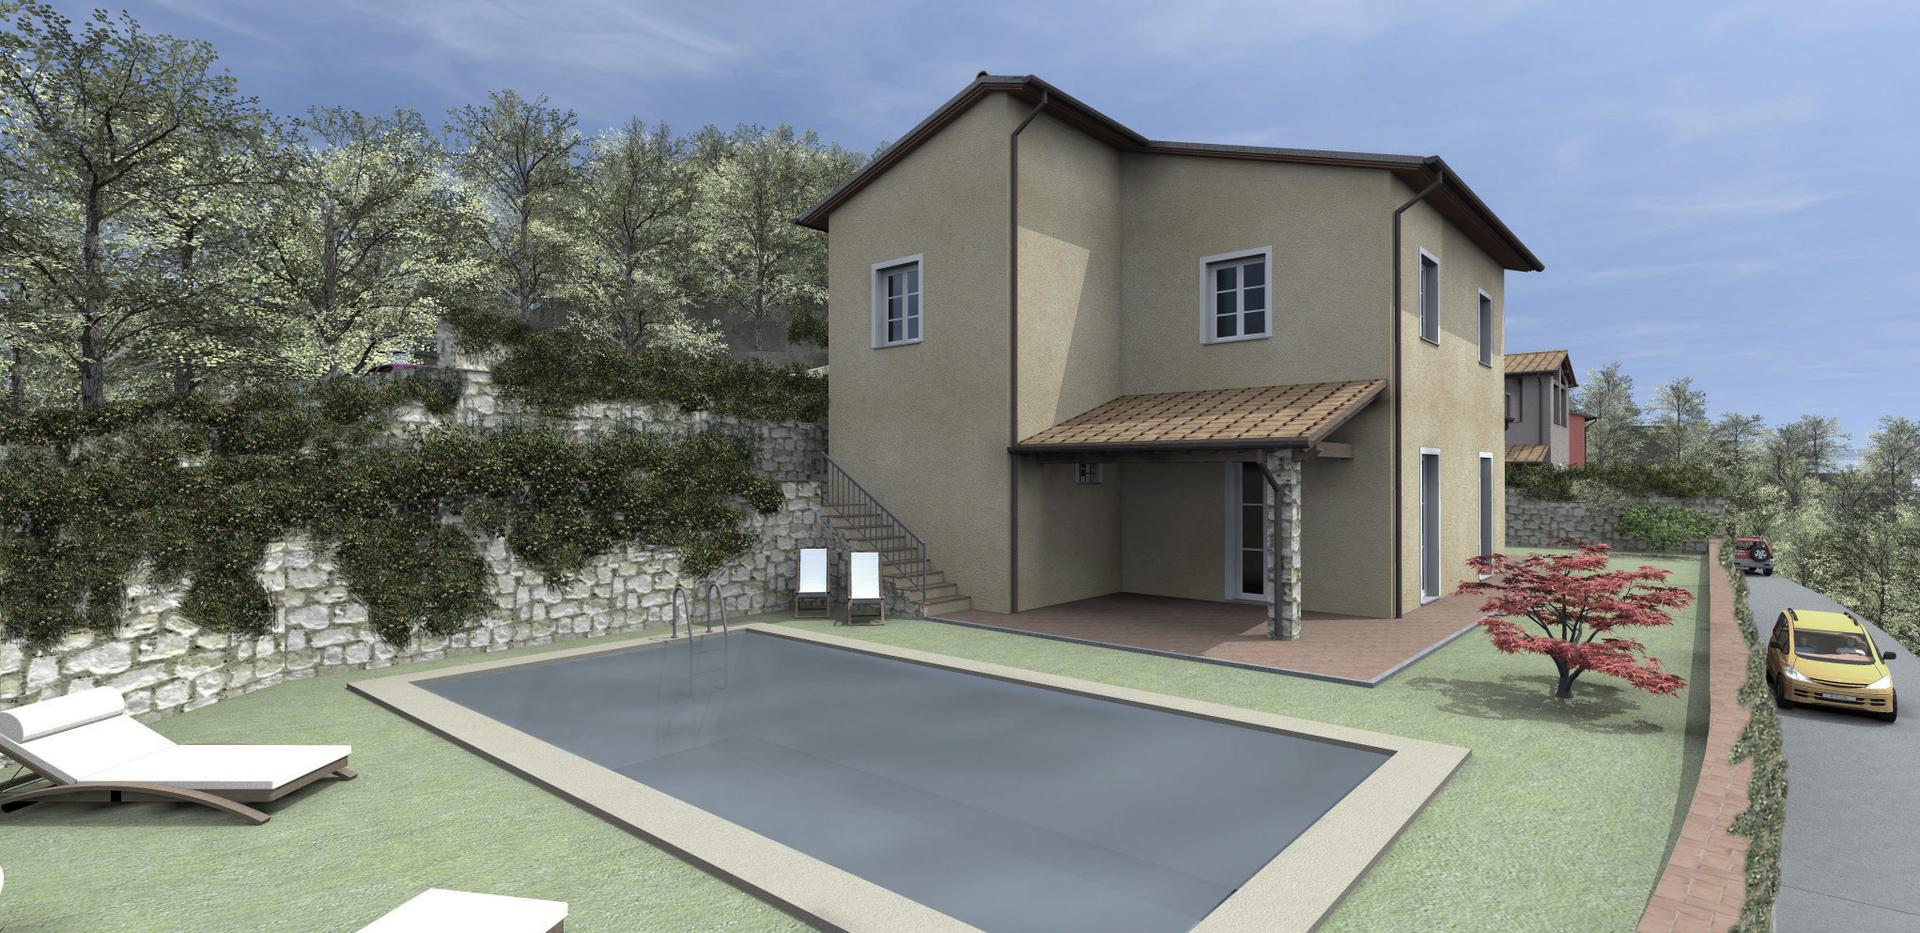 La Casa Grigia